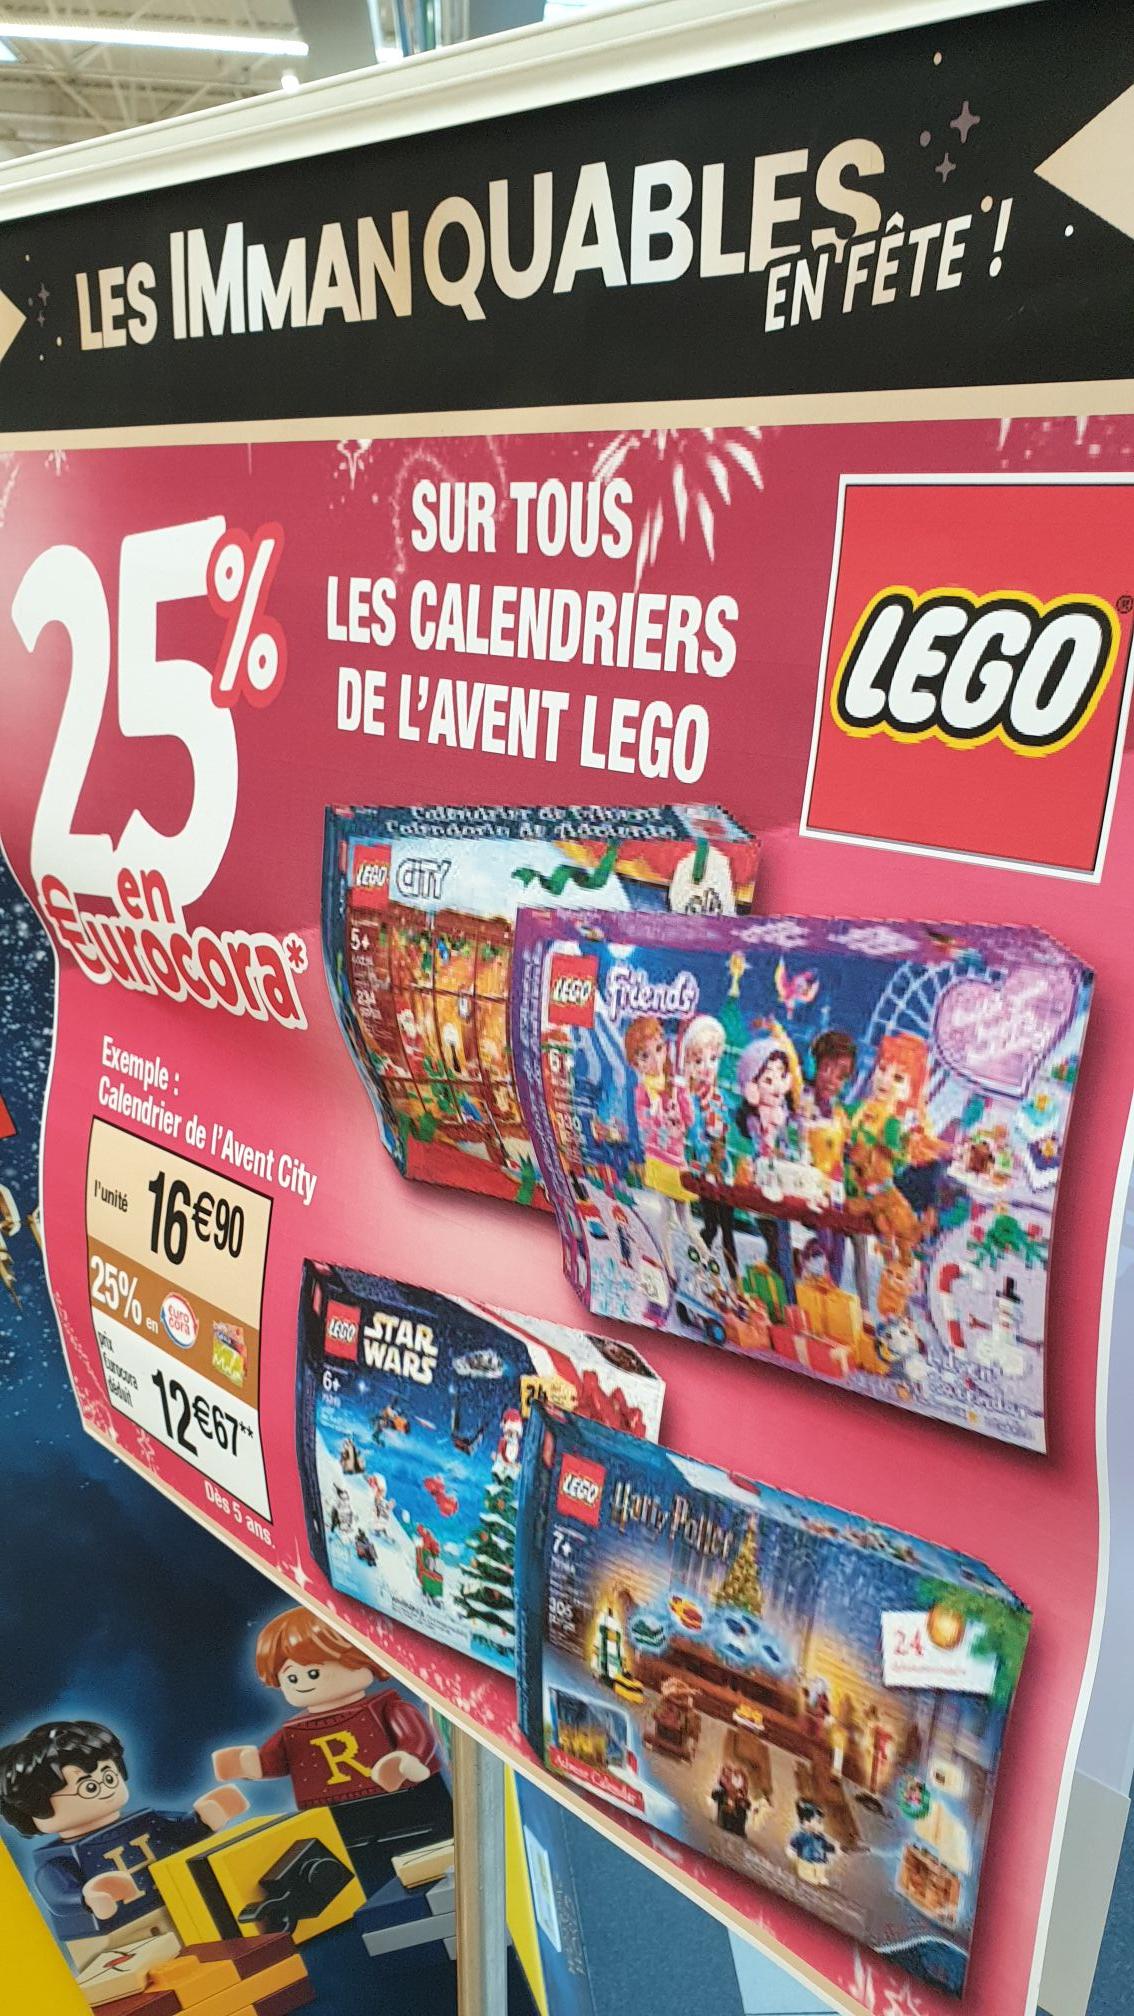 Calendrier Avent Lego City.Calendrier De L Avent Lego Via 4 2 Sur La Carte